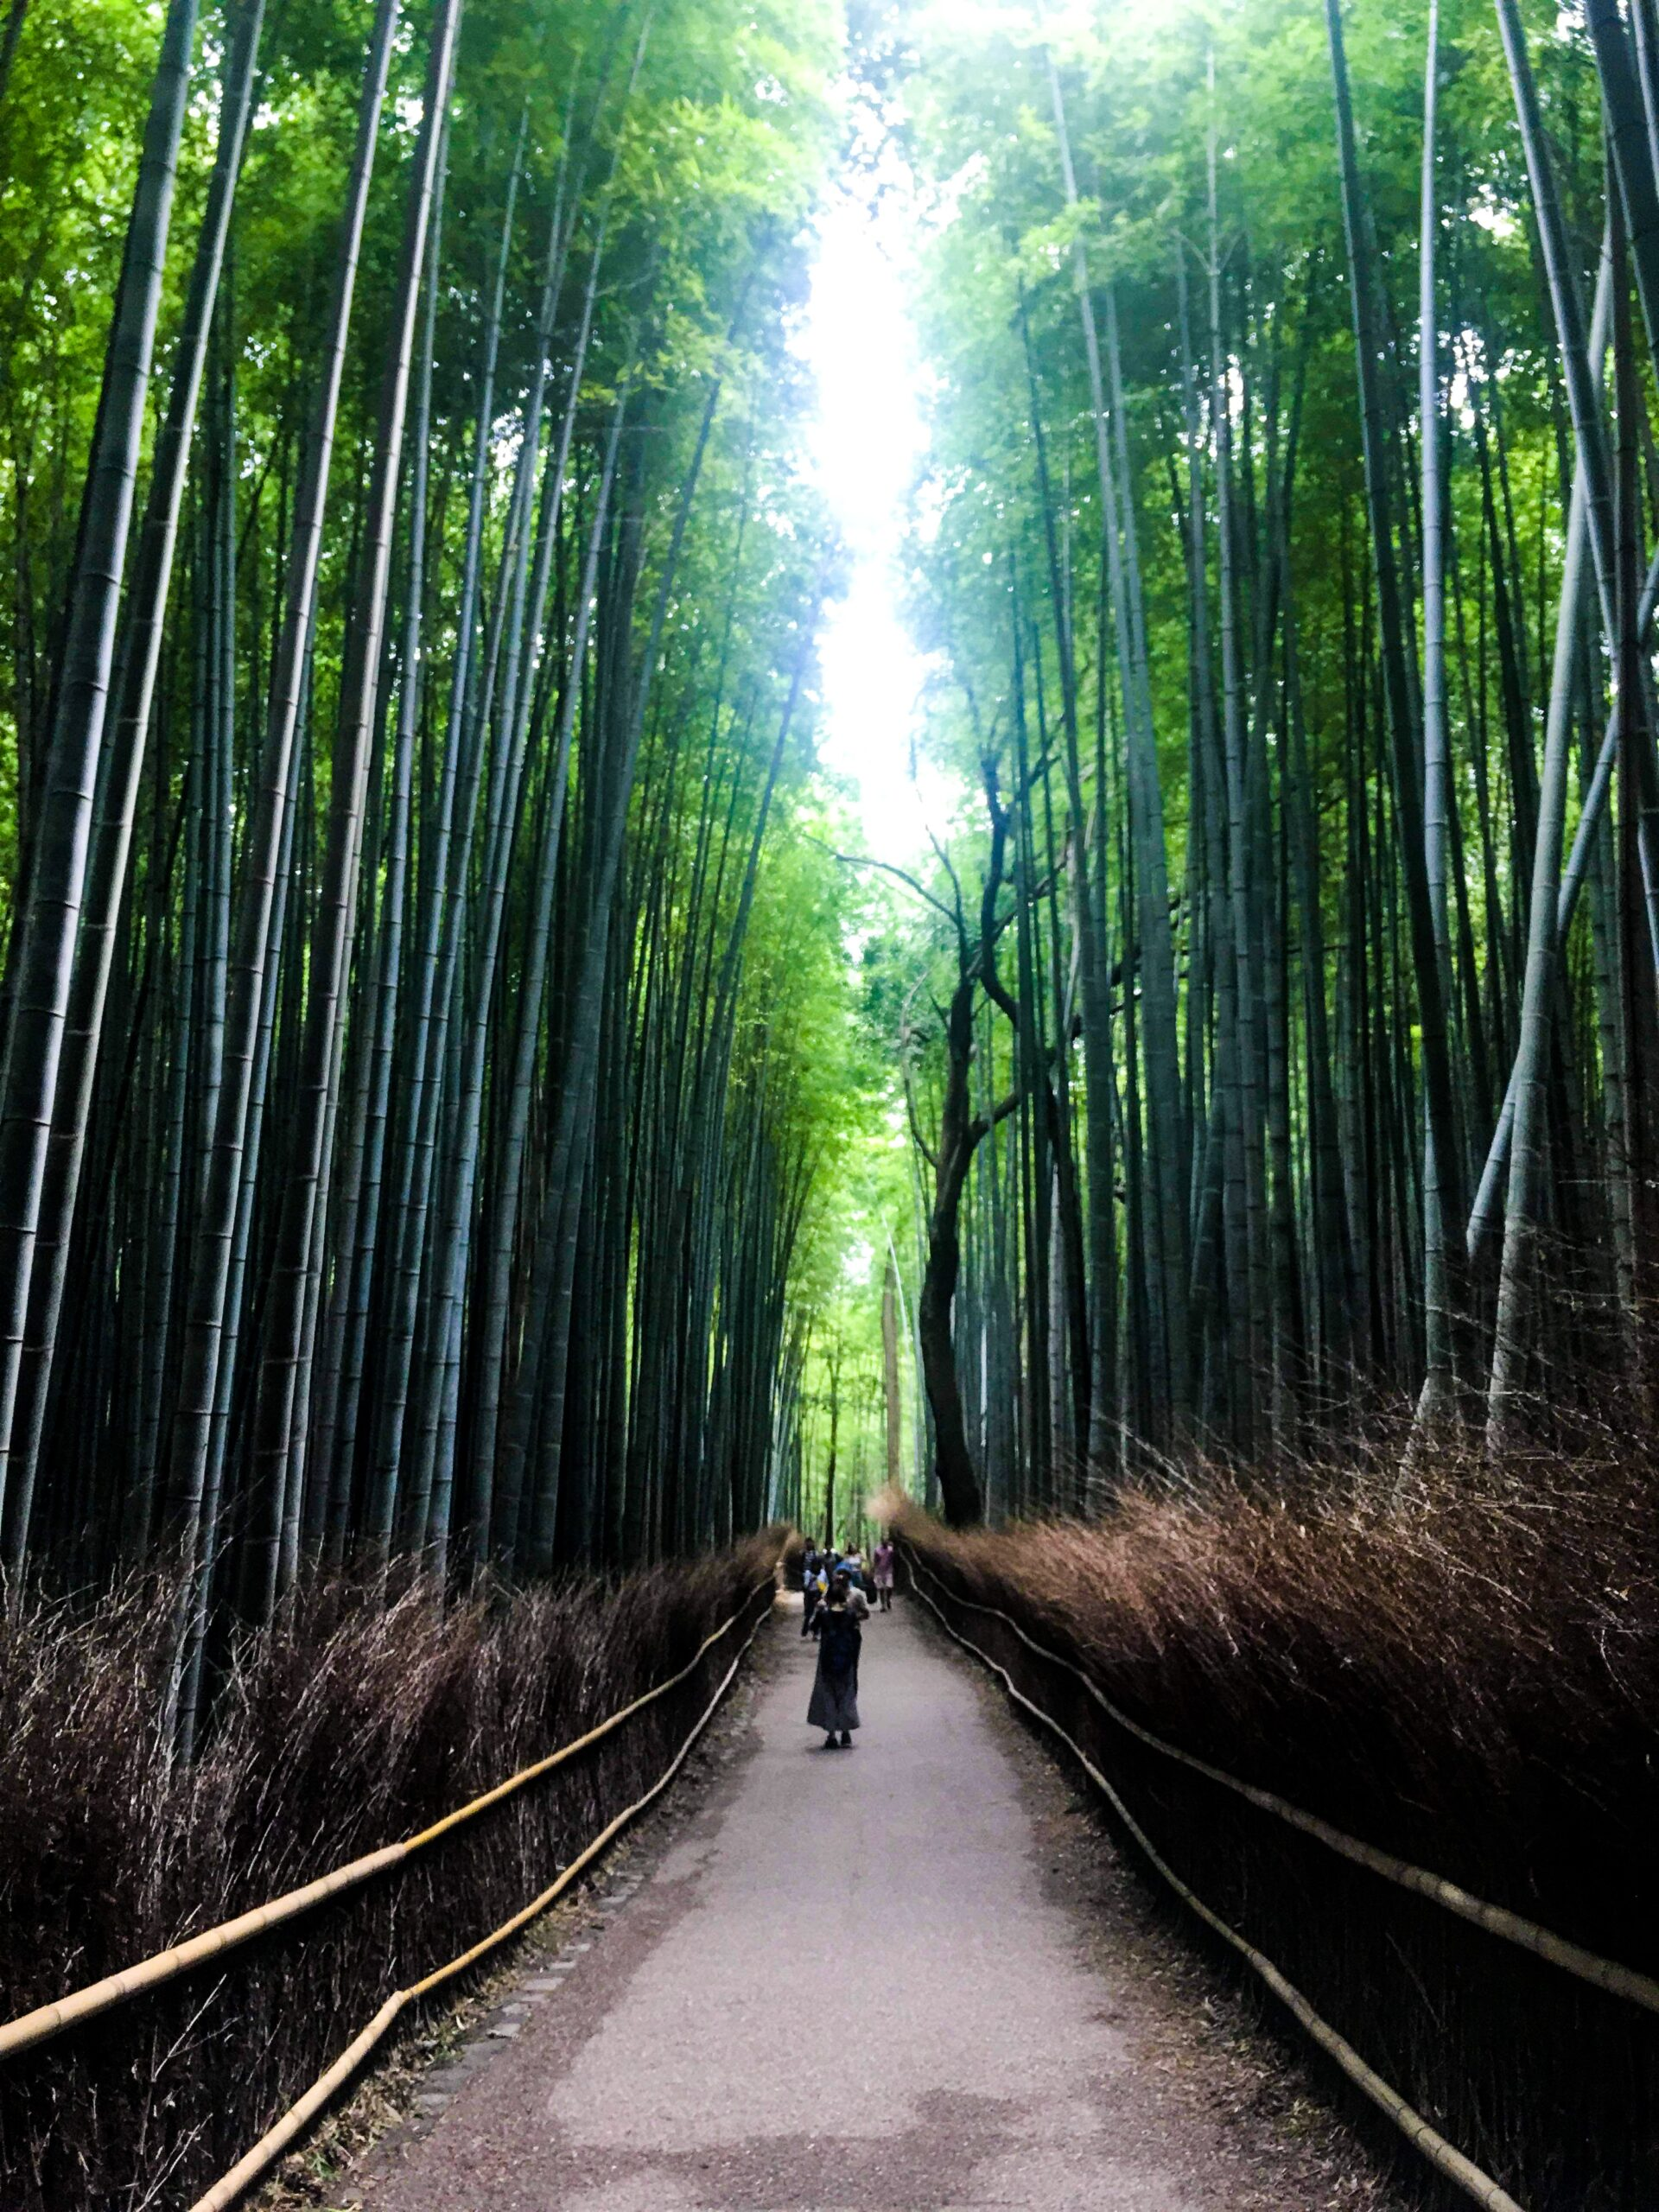 kon-karampelas-Bamboo Forest-unsplash